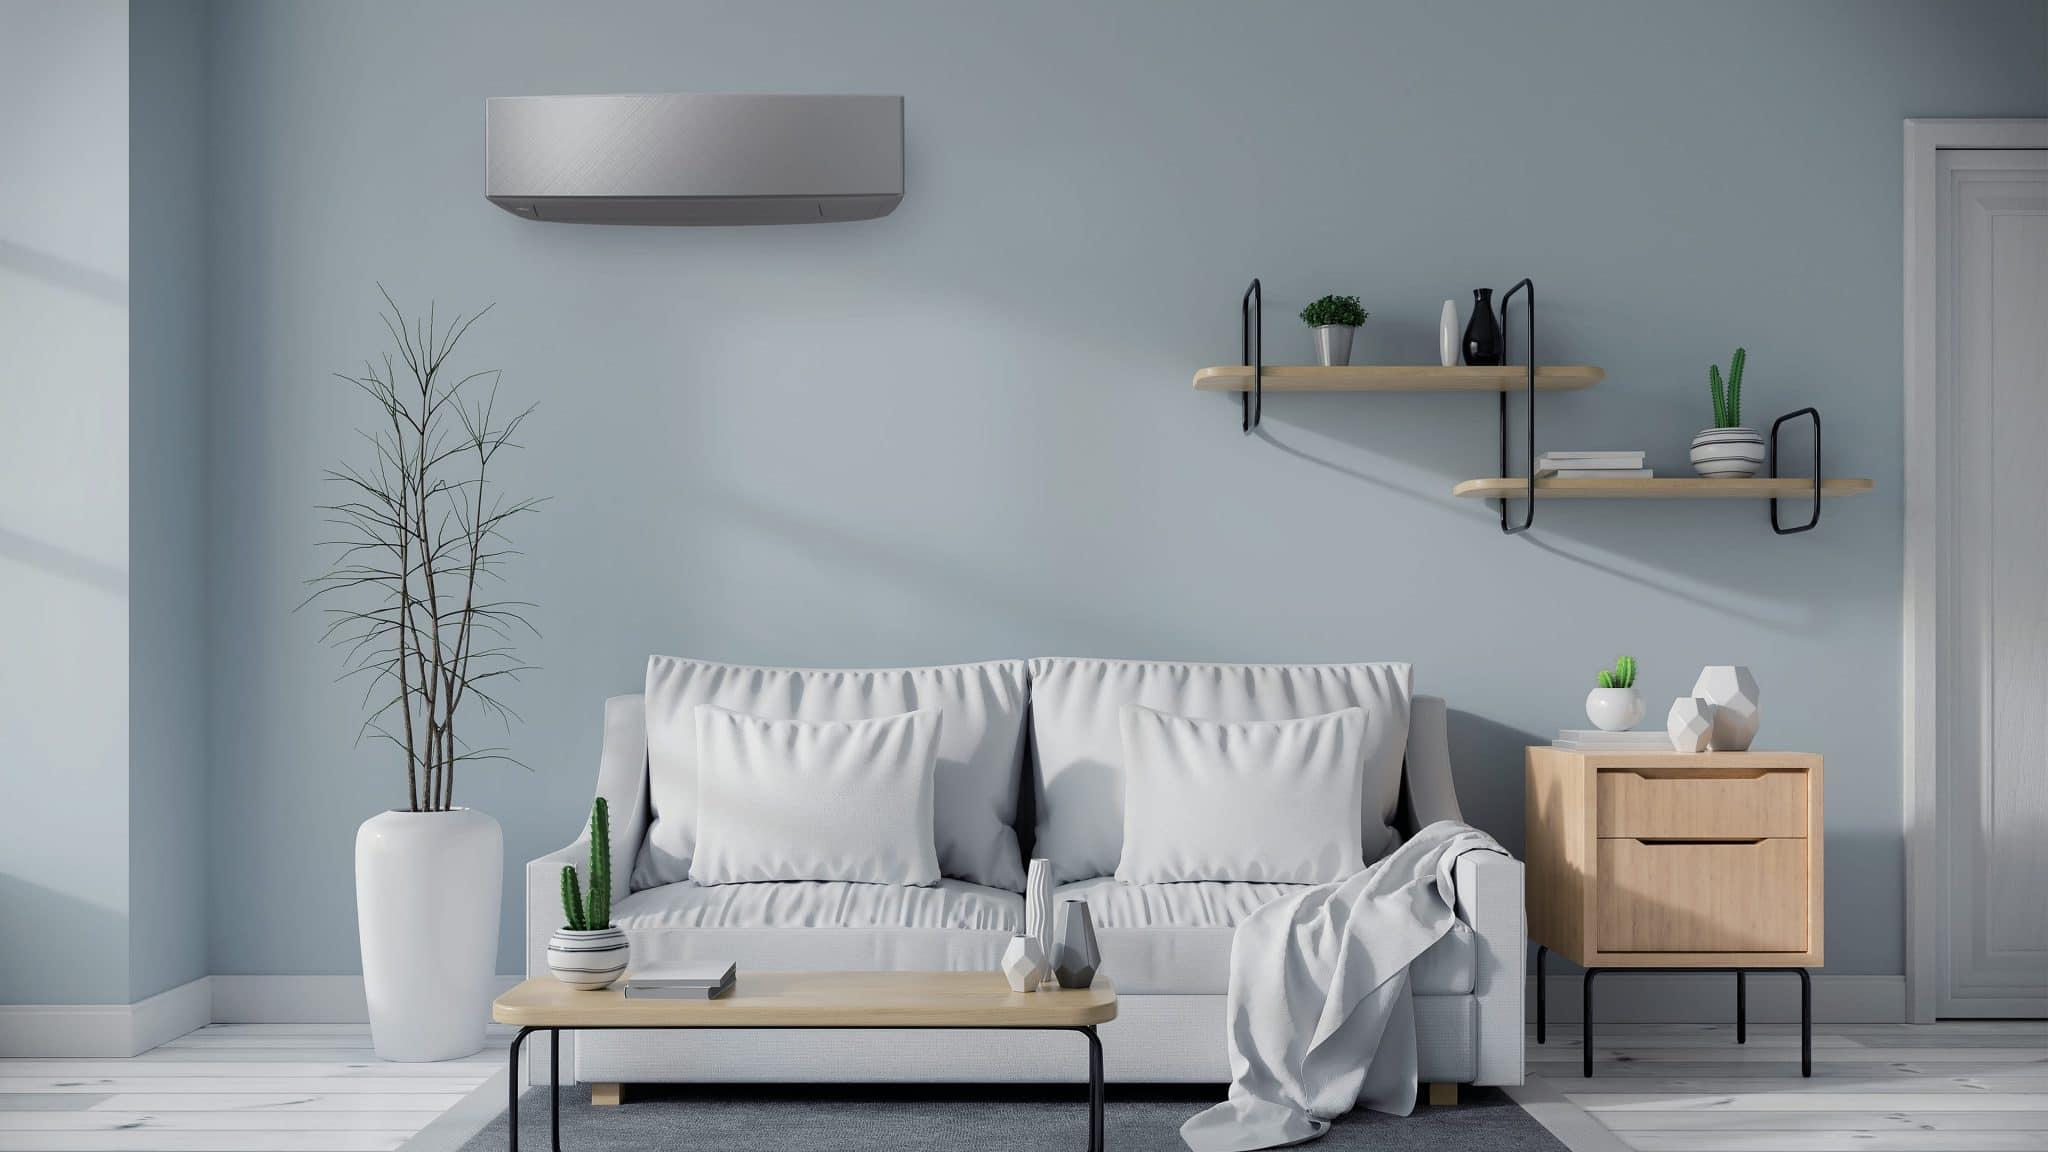 Green House Solutions zonnepanelen batterijopslag laadpalen airconditioning fujitsu 000007